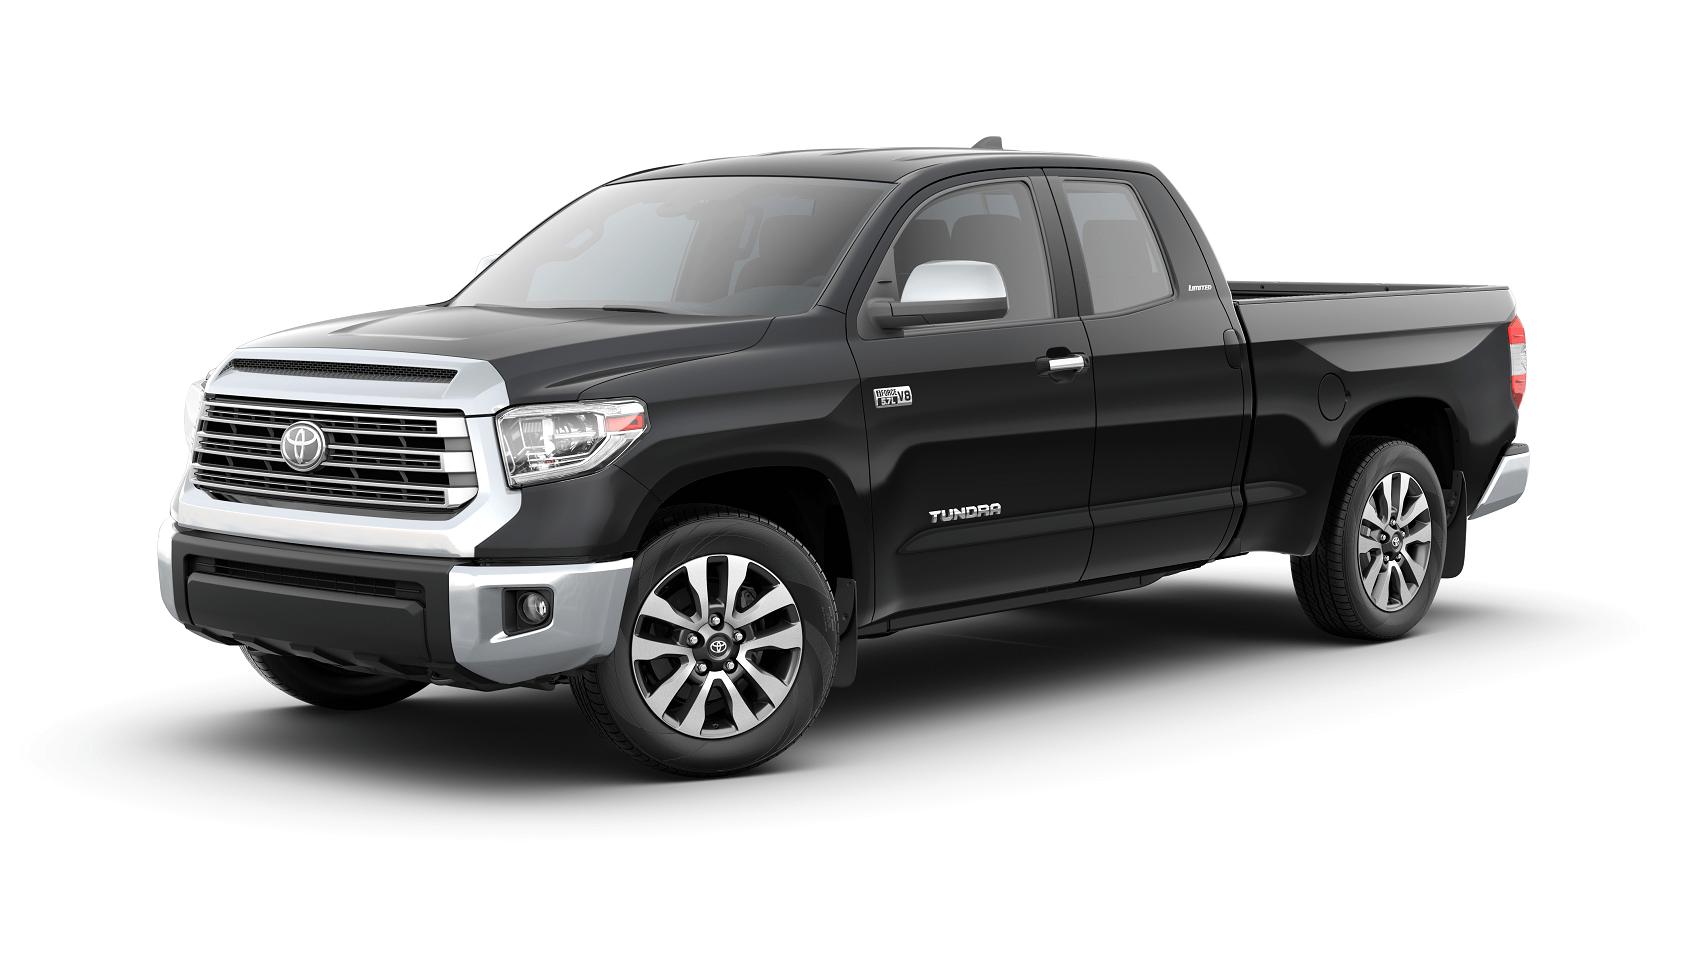 2019 Toyota Tundra 1794 Edition Trim